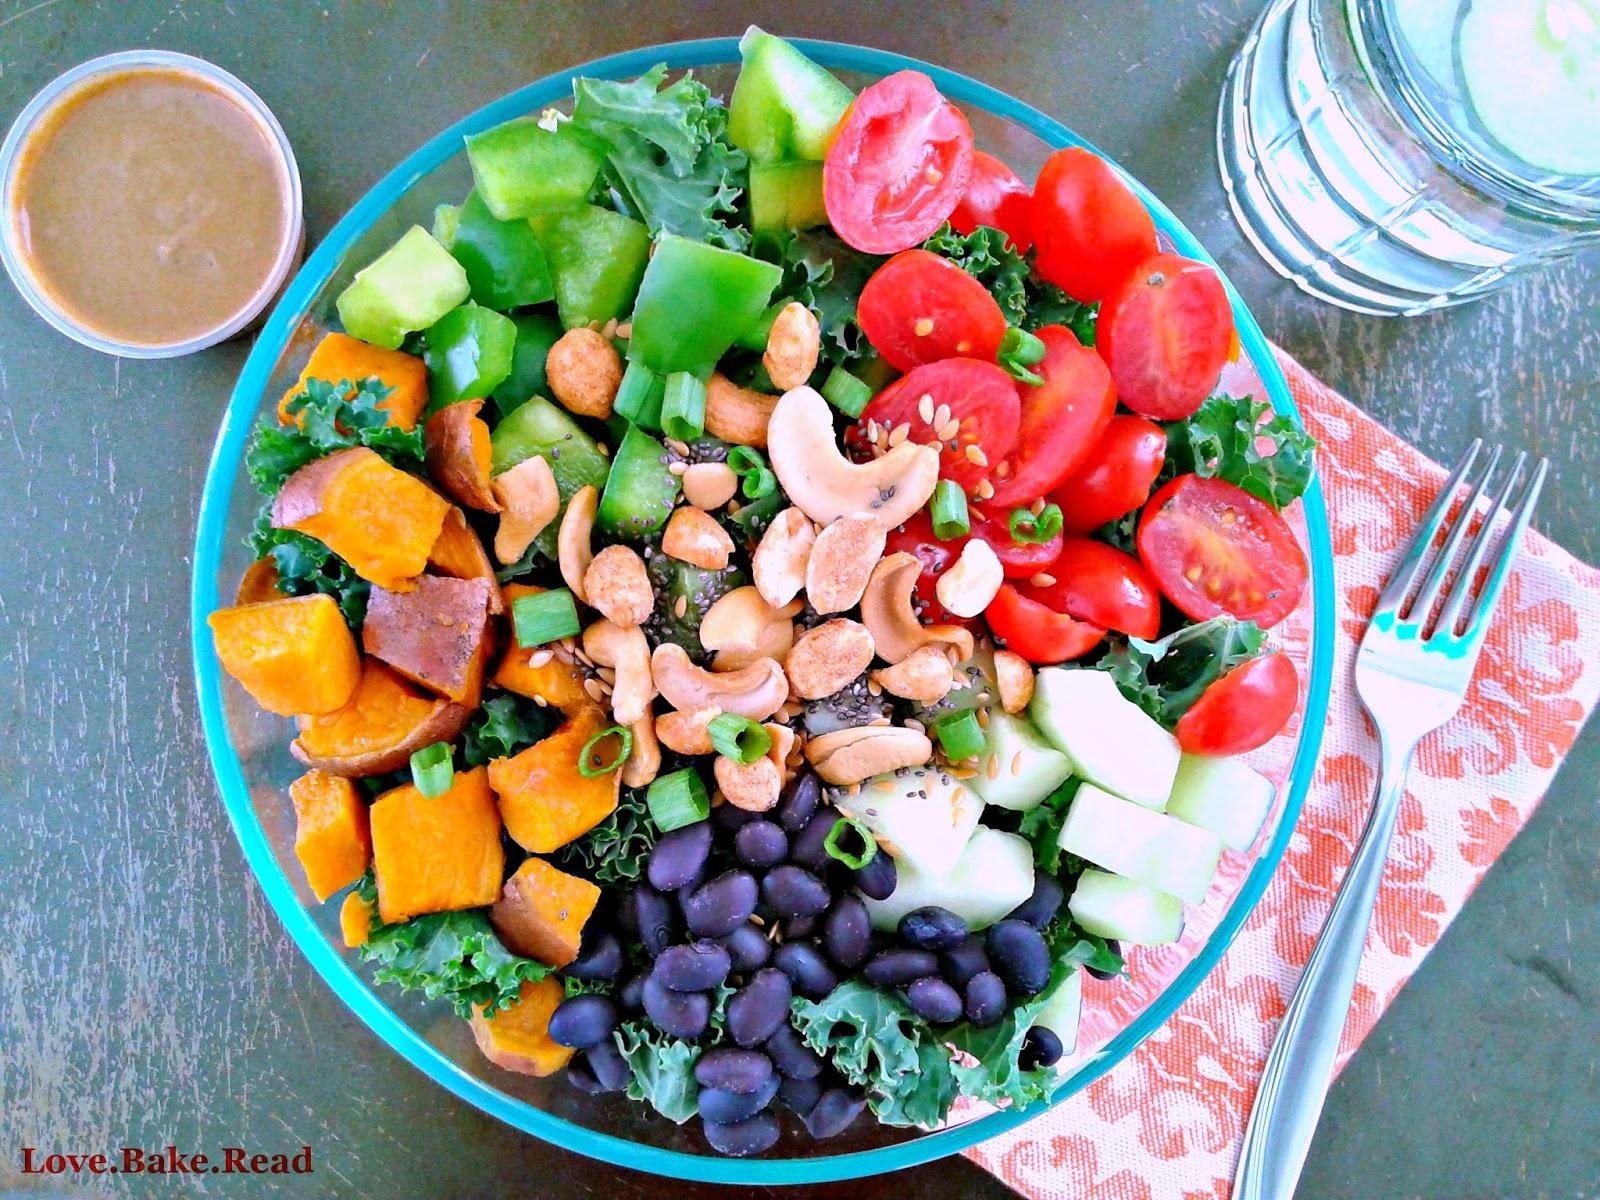 Loaded Veggie Kale Salad with Almond Butter Dressing     Love.Bake.Read